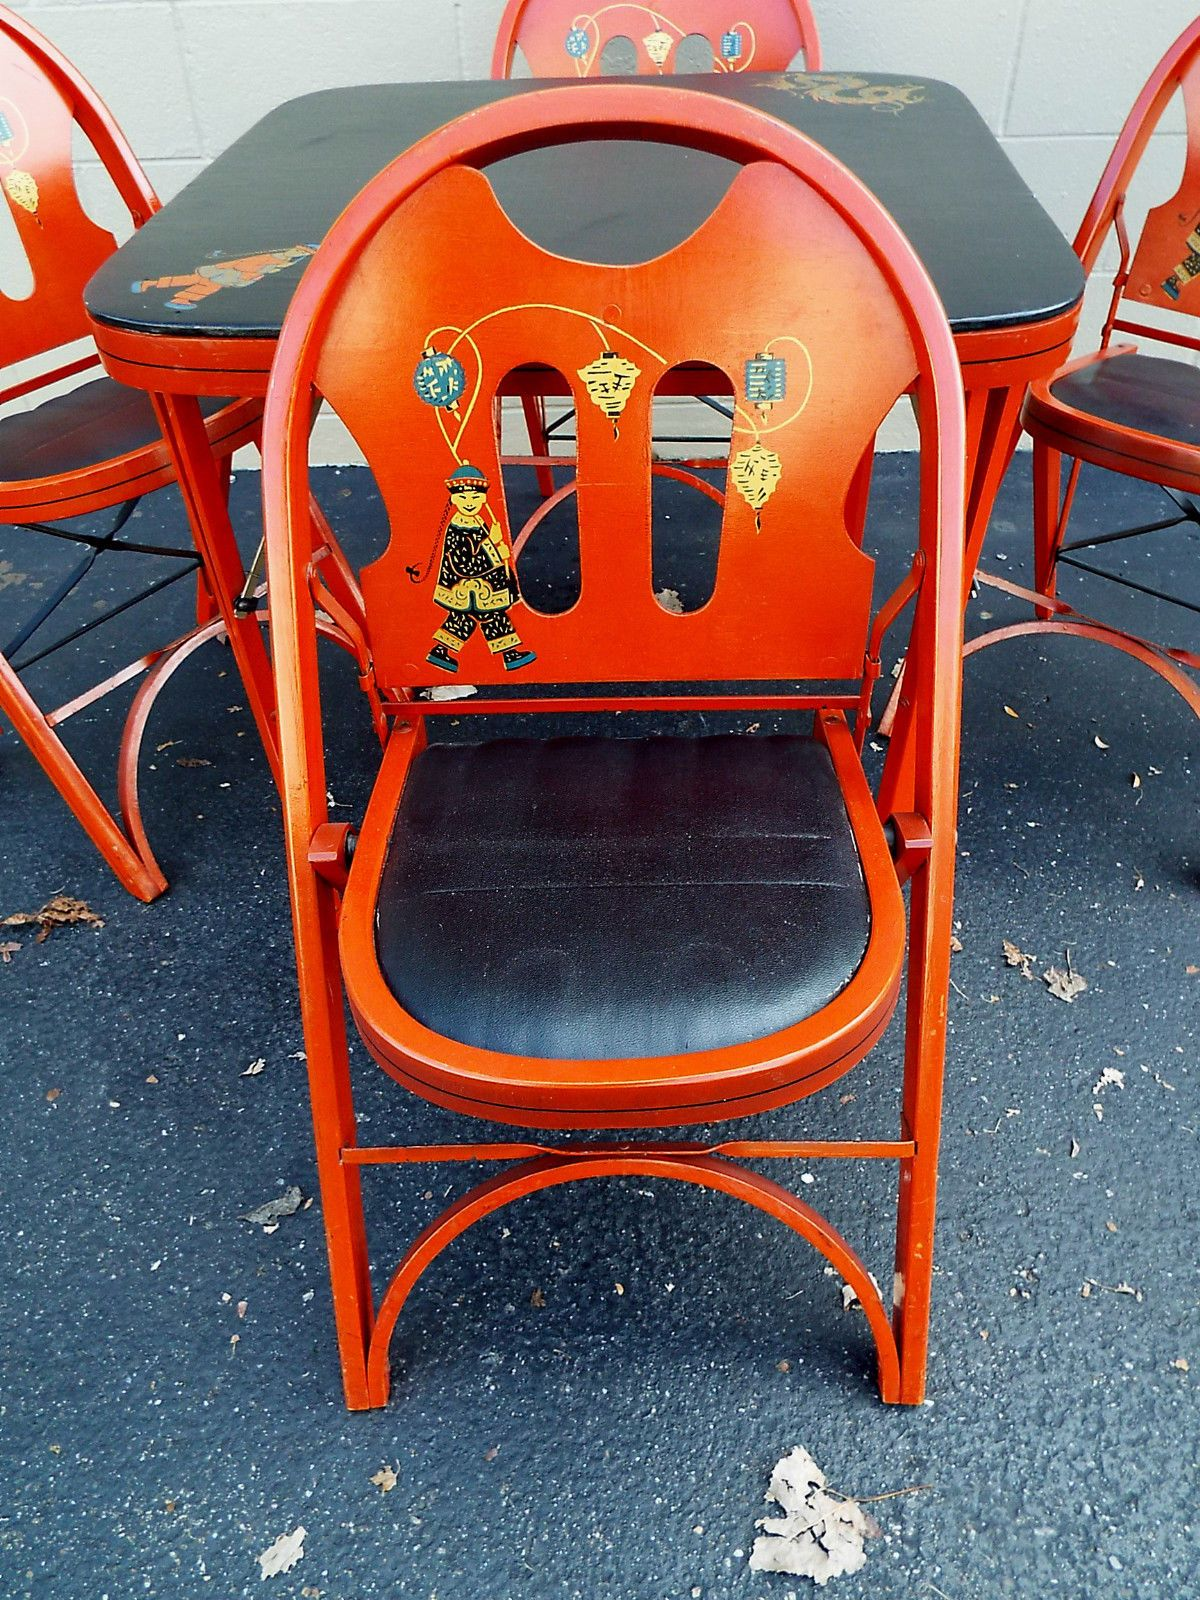 Vintage Bridge Card Bridge MahJong Table folding Chairs Oriental